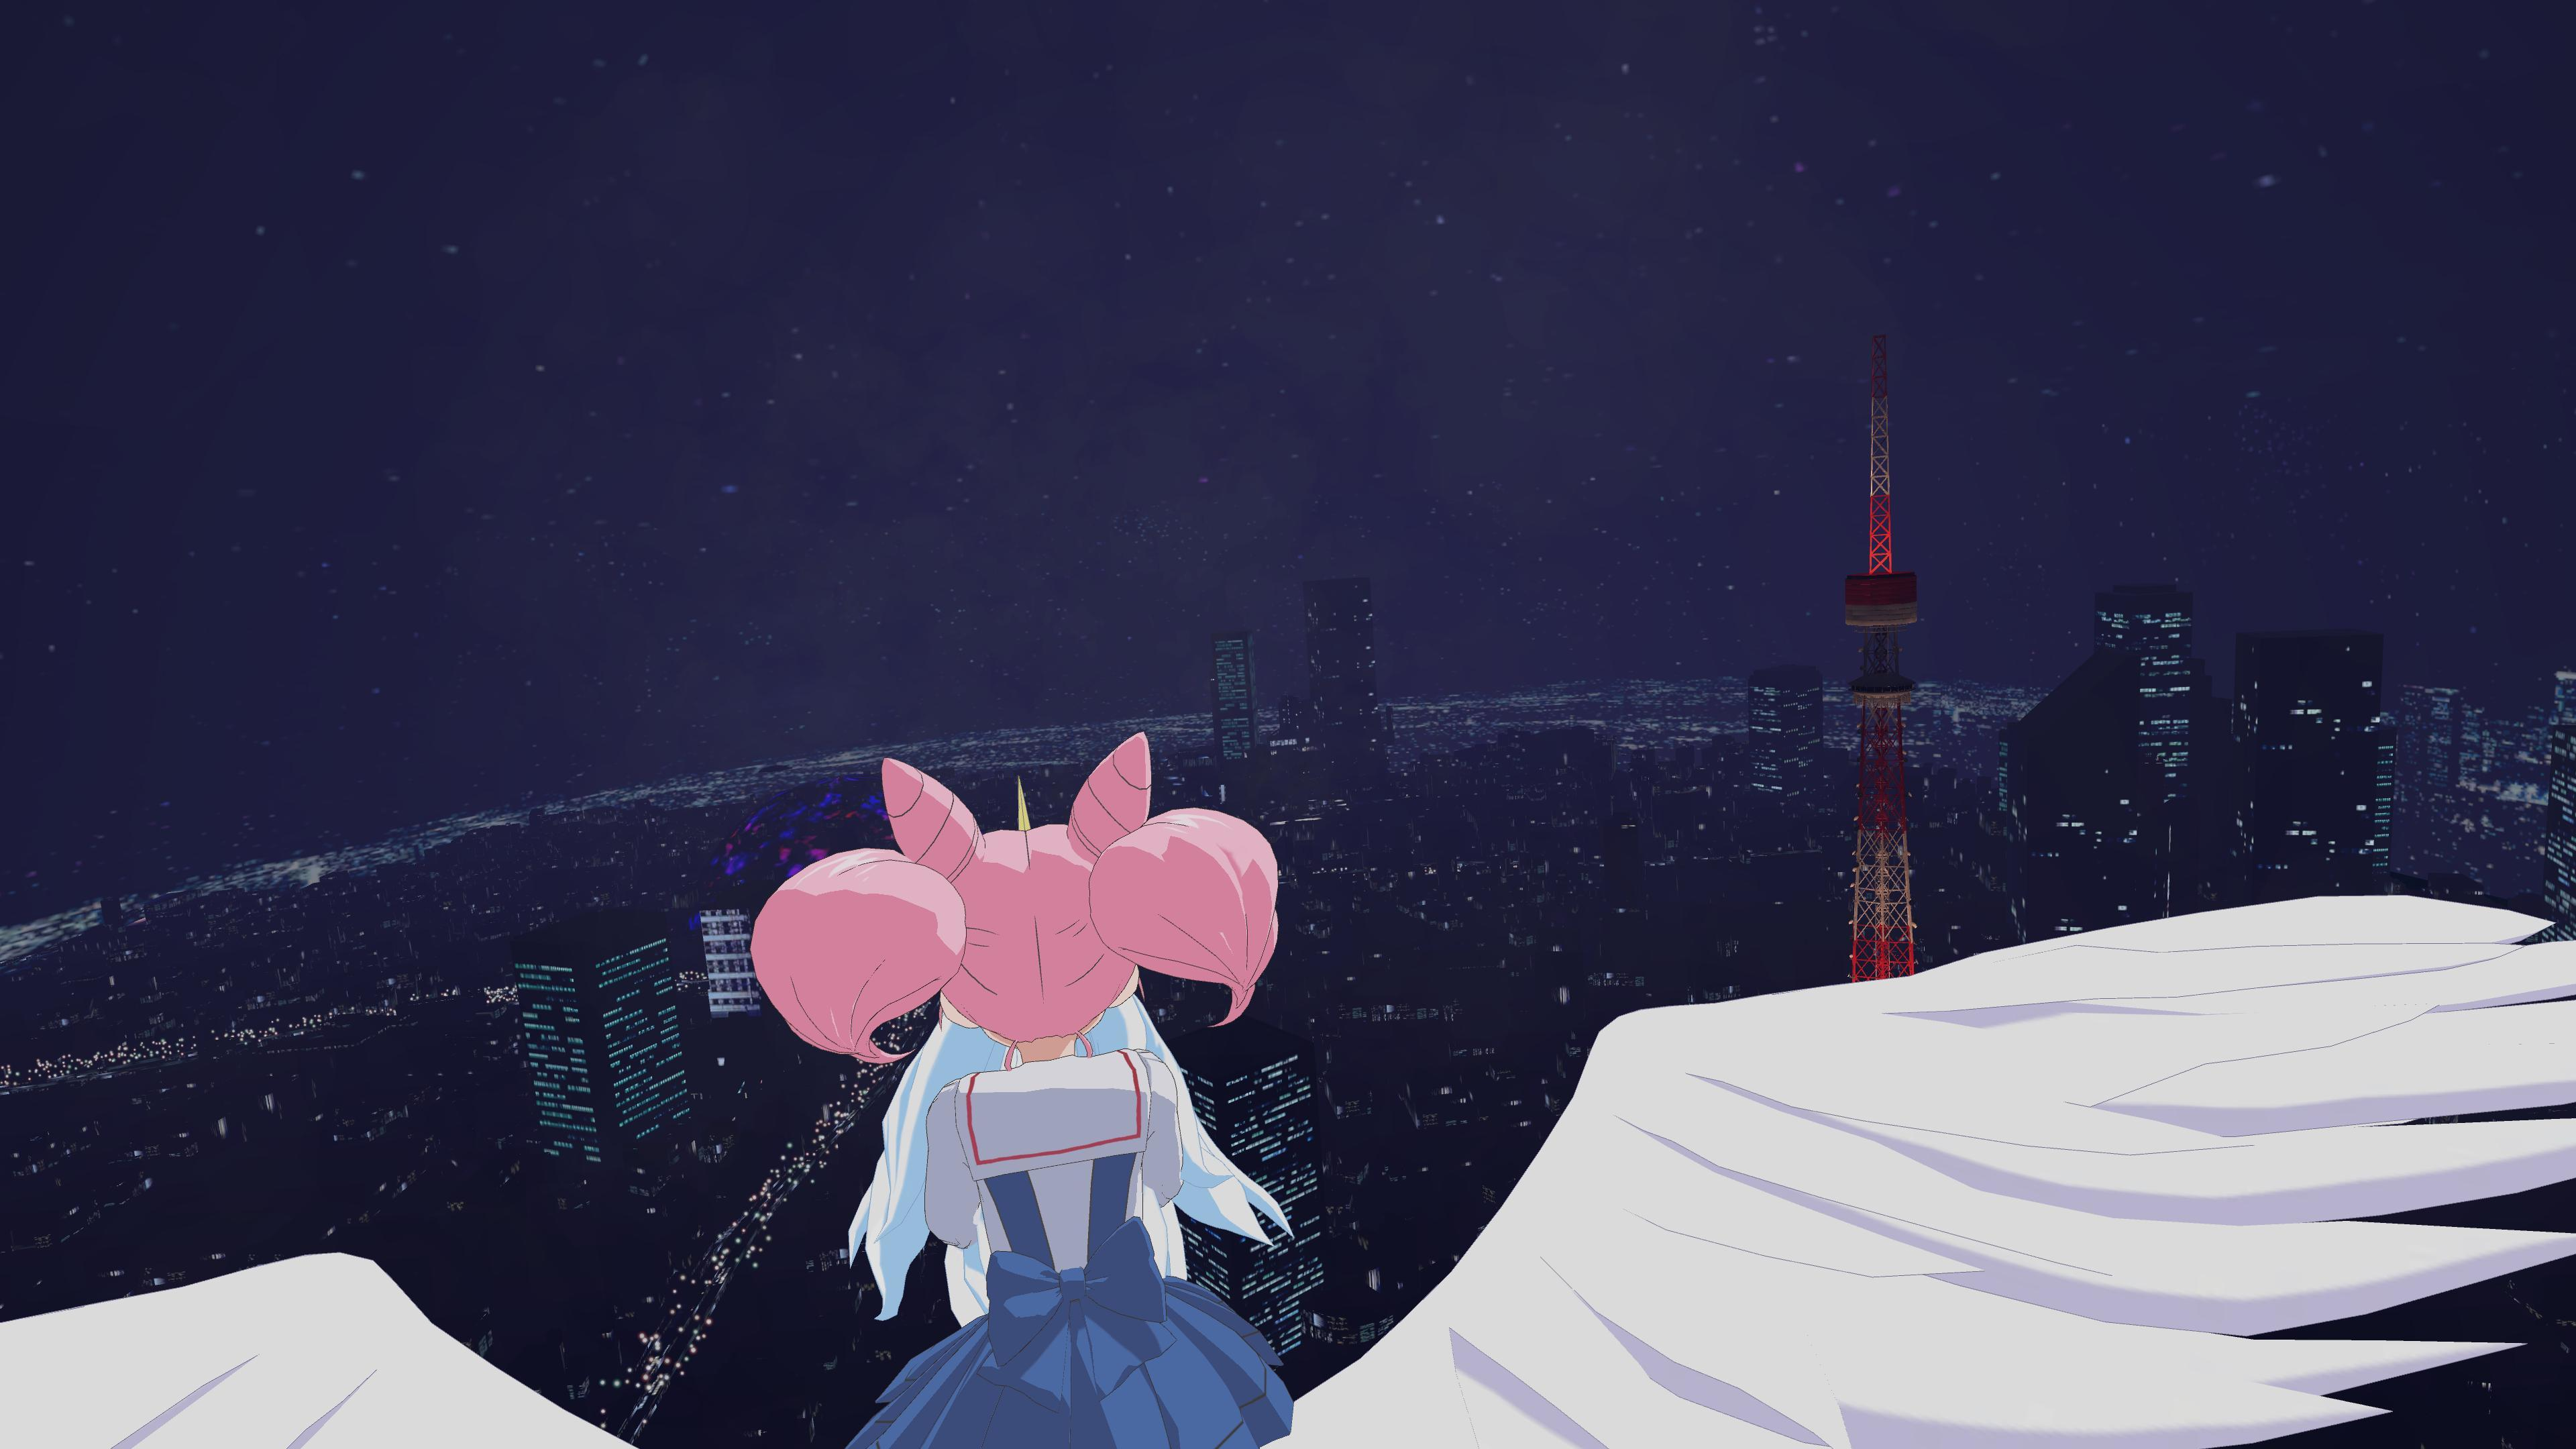 (C)武内直子・PNP/劇場版「美少女戦士セーラームーンEternal」製作委員会